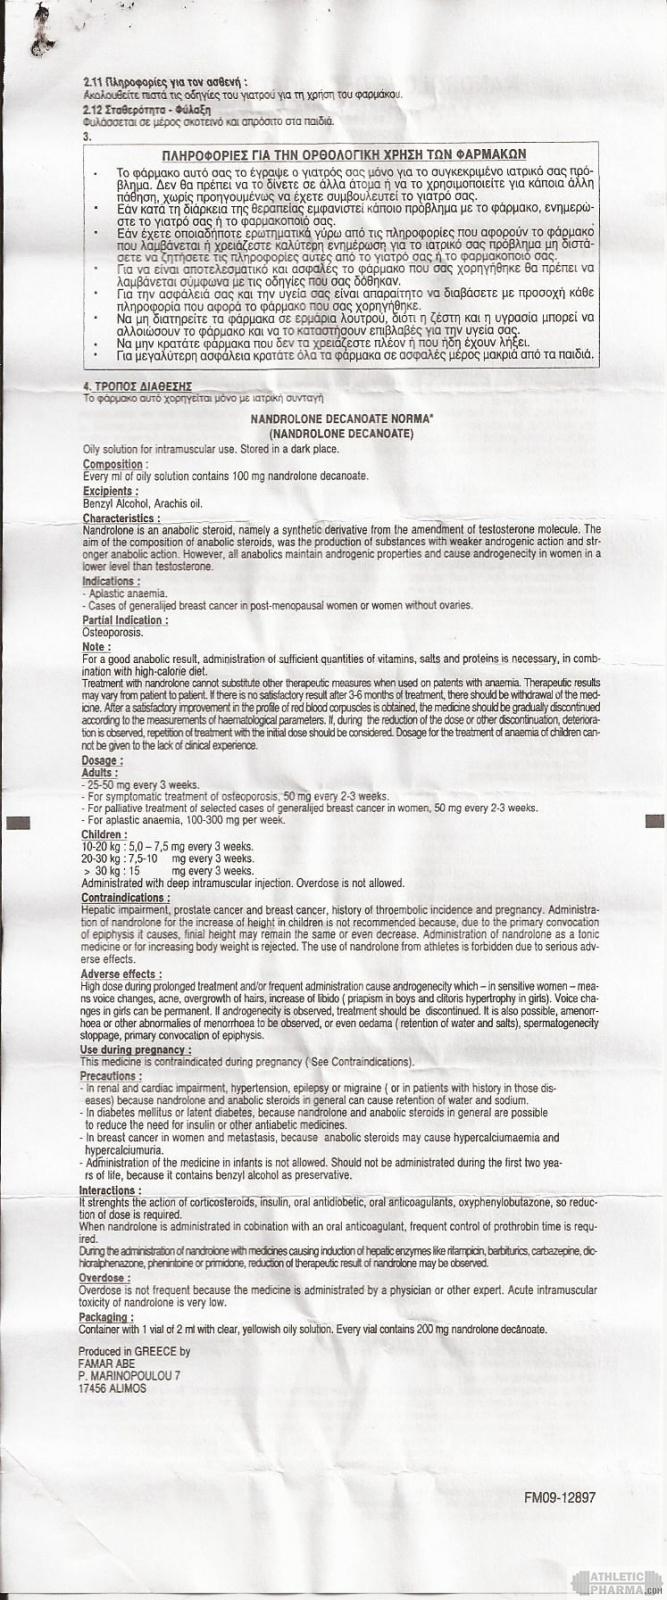 Nandrolone Decanoate norma инструкция-2 (вкладыш)